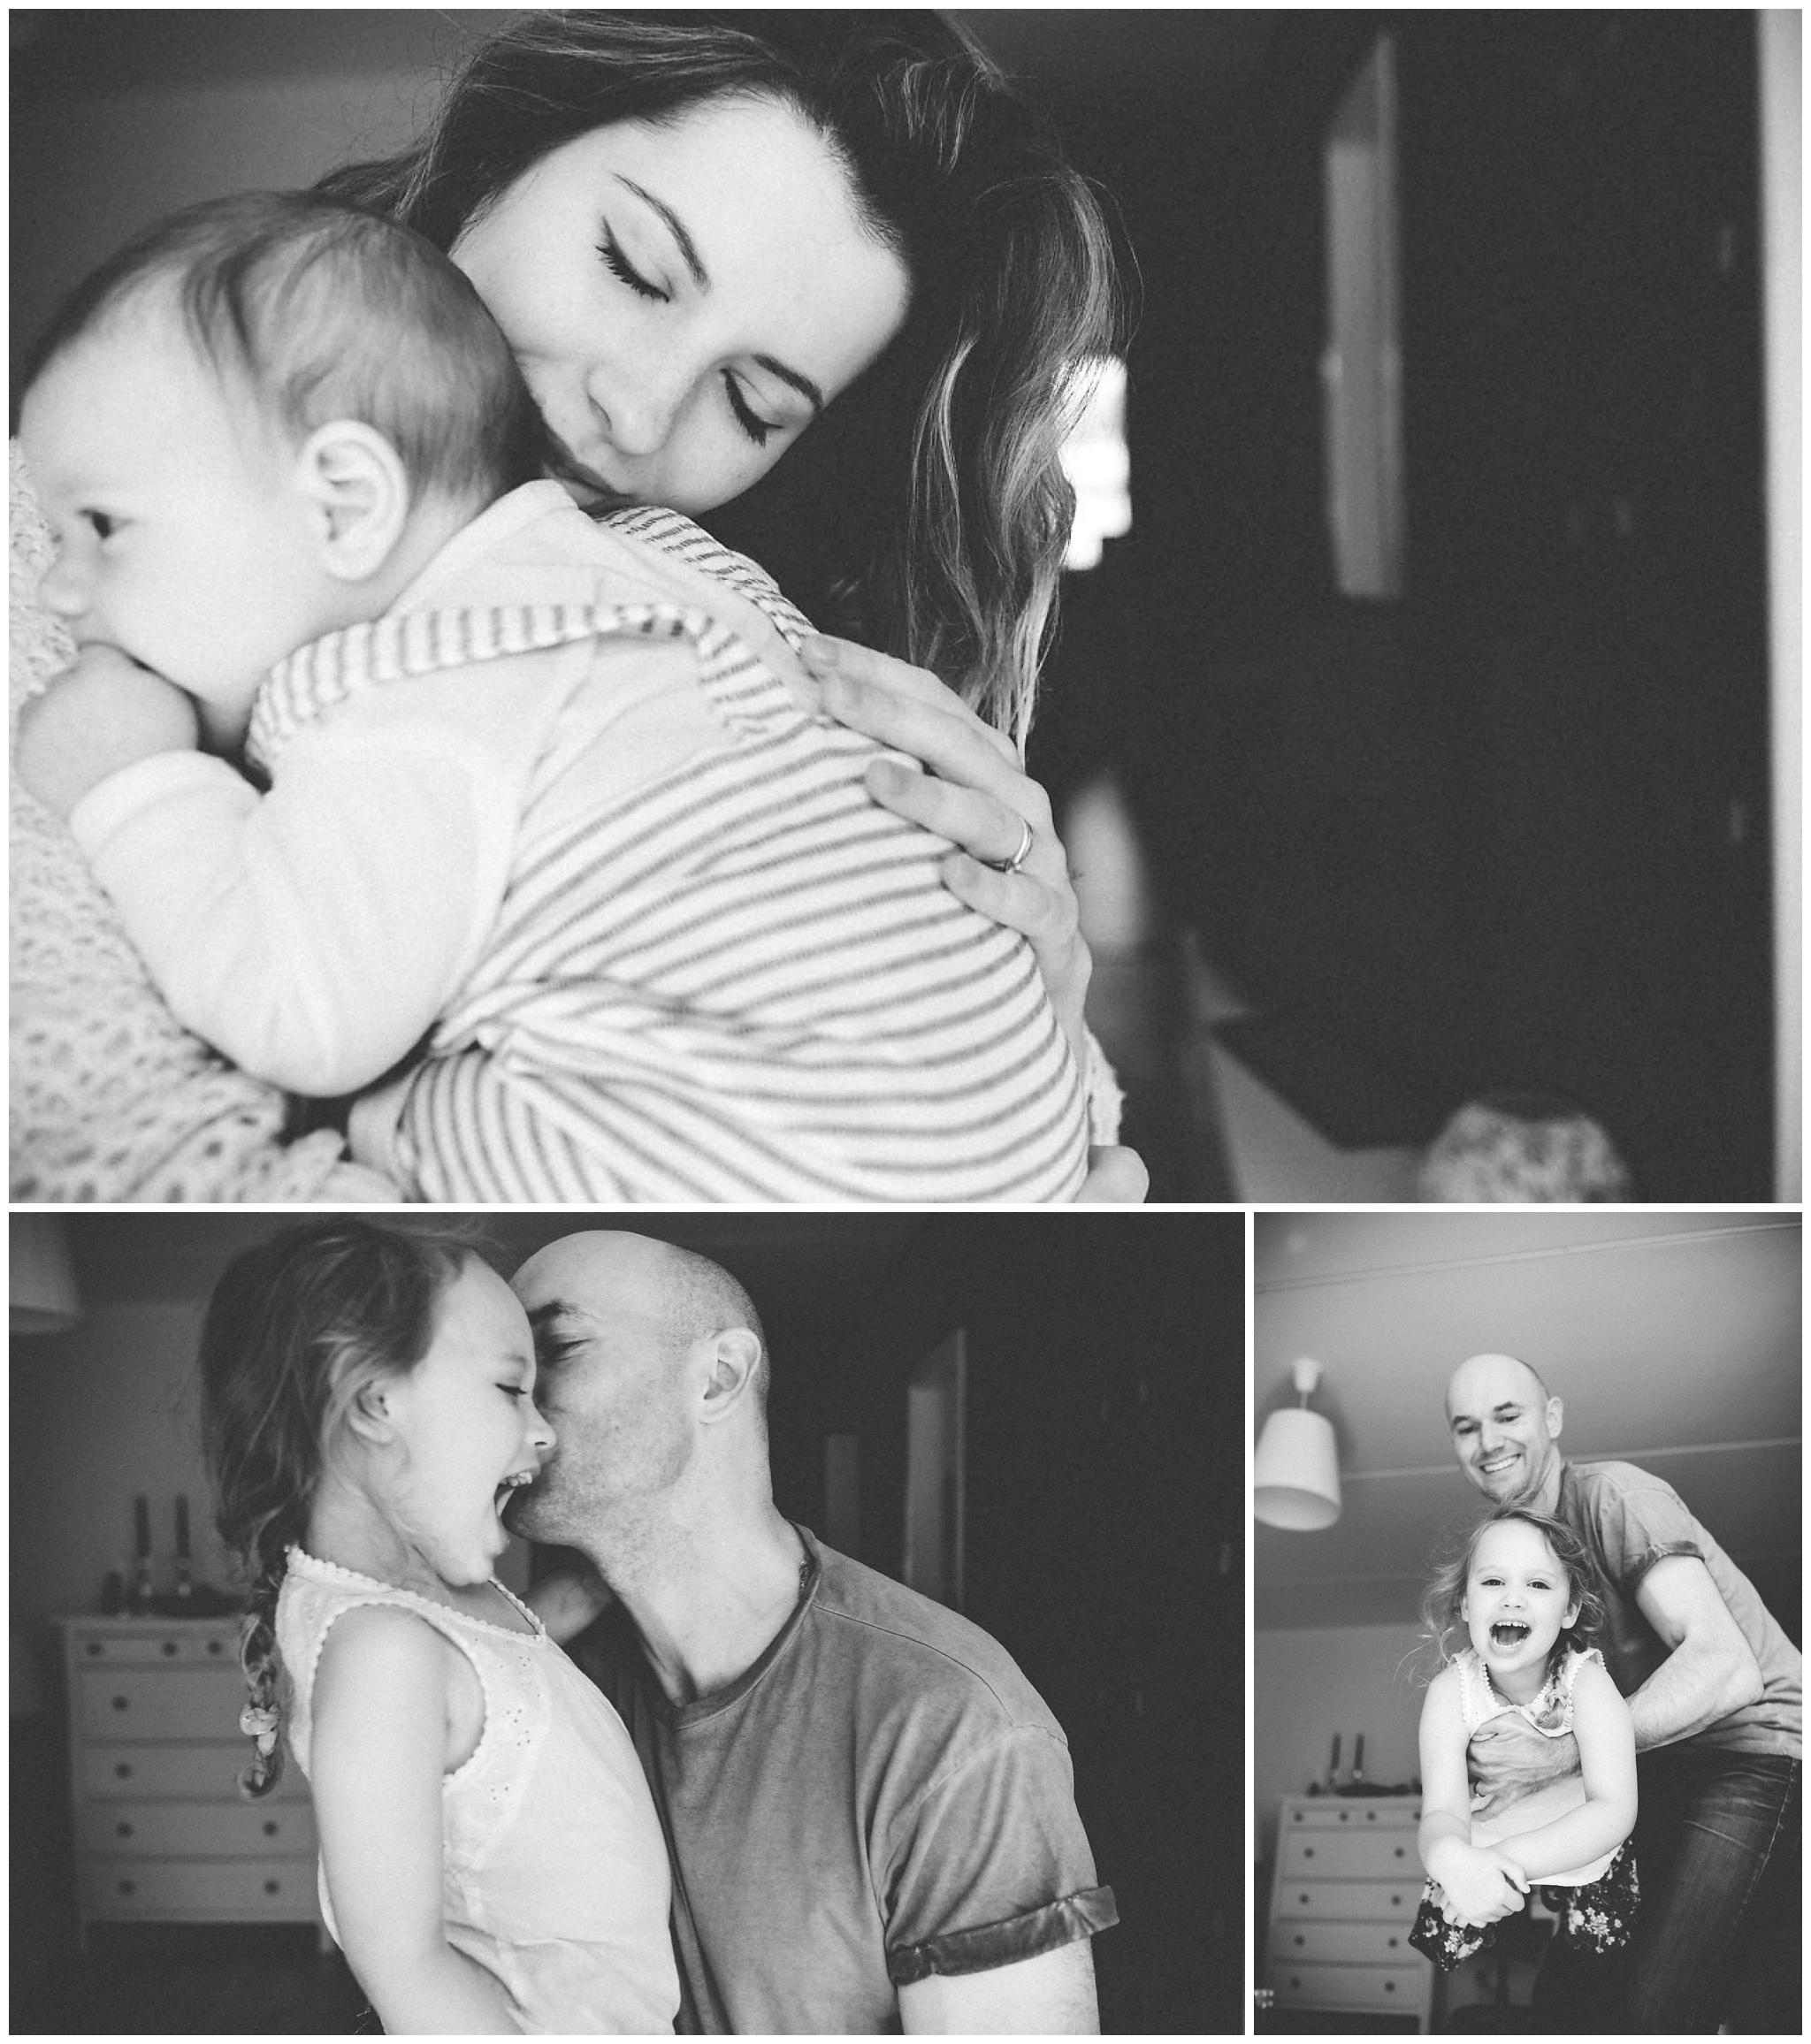 familjefotograf stockholm, familjefotograf vallentuna, familjefotograf täby, barnfotograf stockholm, familjebilder, familjefotografering stockholm, studiofotograf, linda rehlin, cecilia pihl,